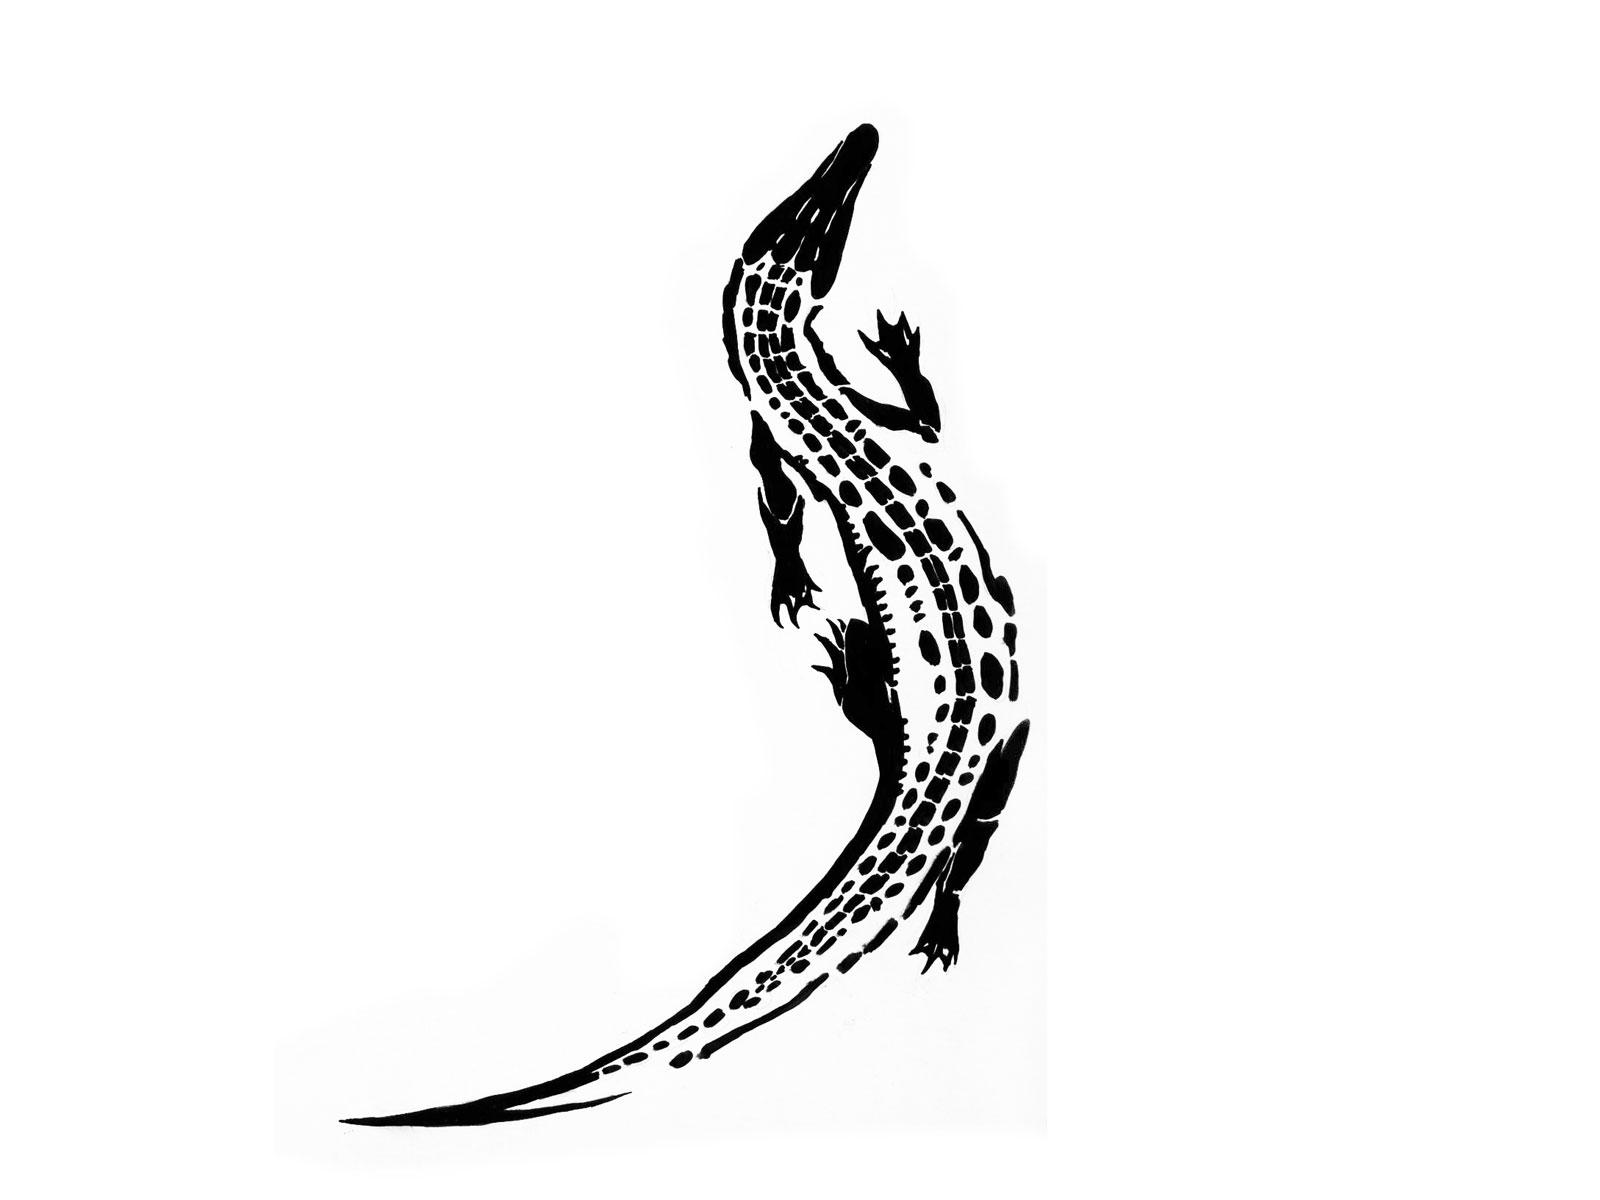 9c2148314 Slim Type Of Crocodile Tattoo - Tattoo Design Ideas